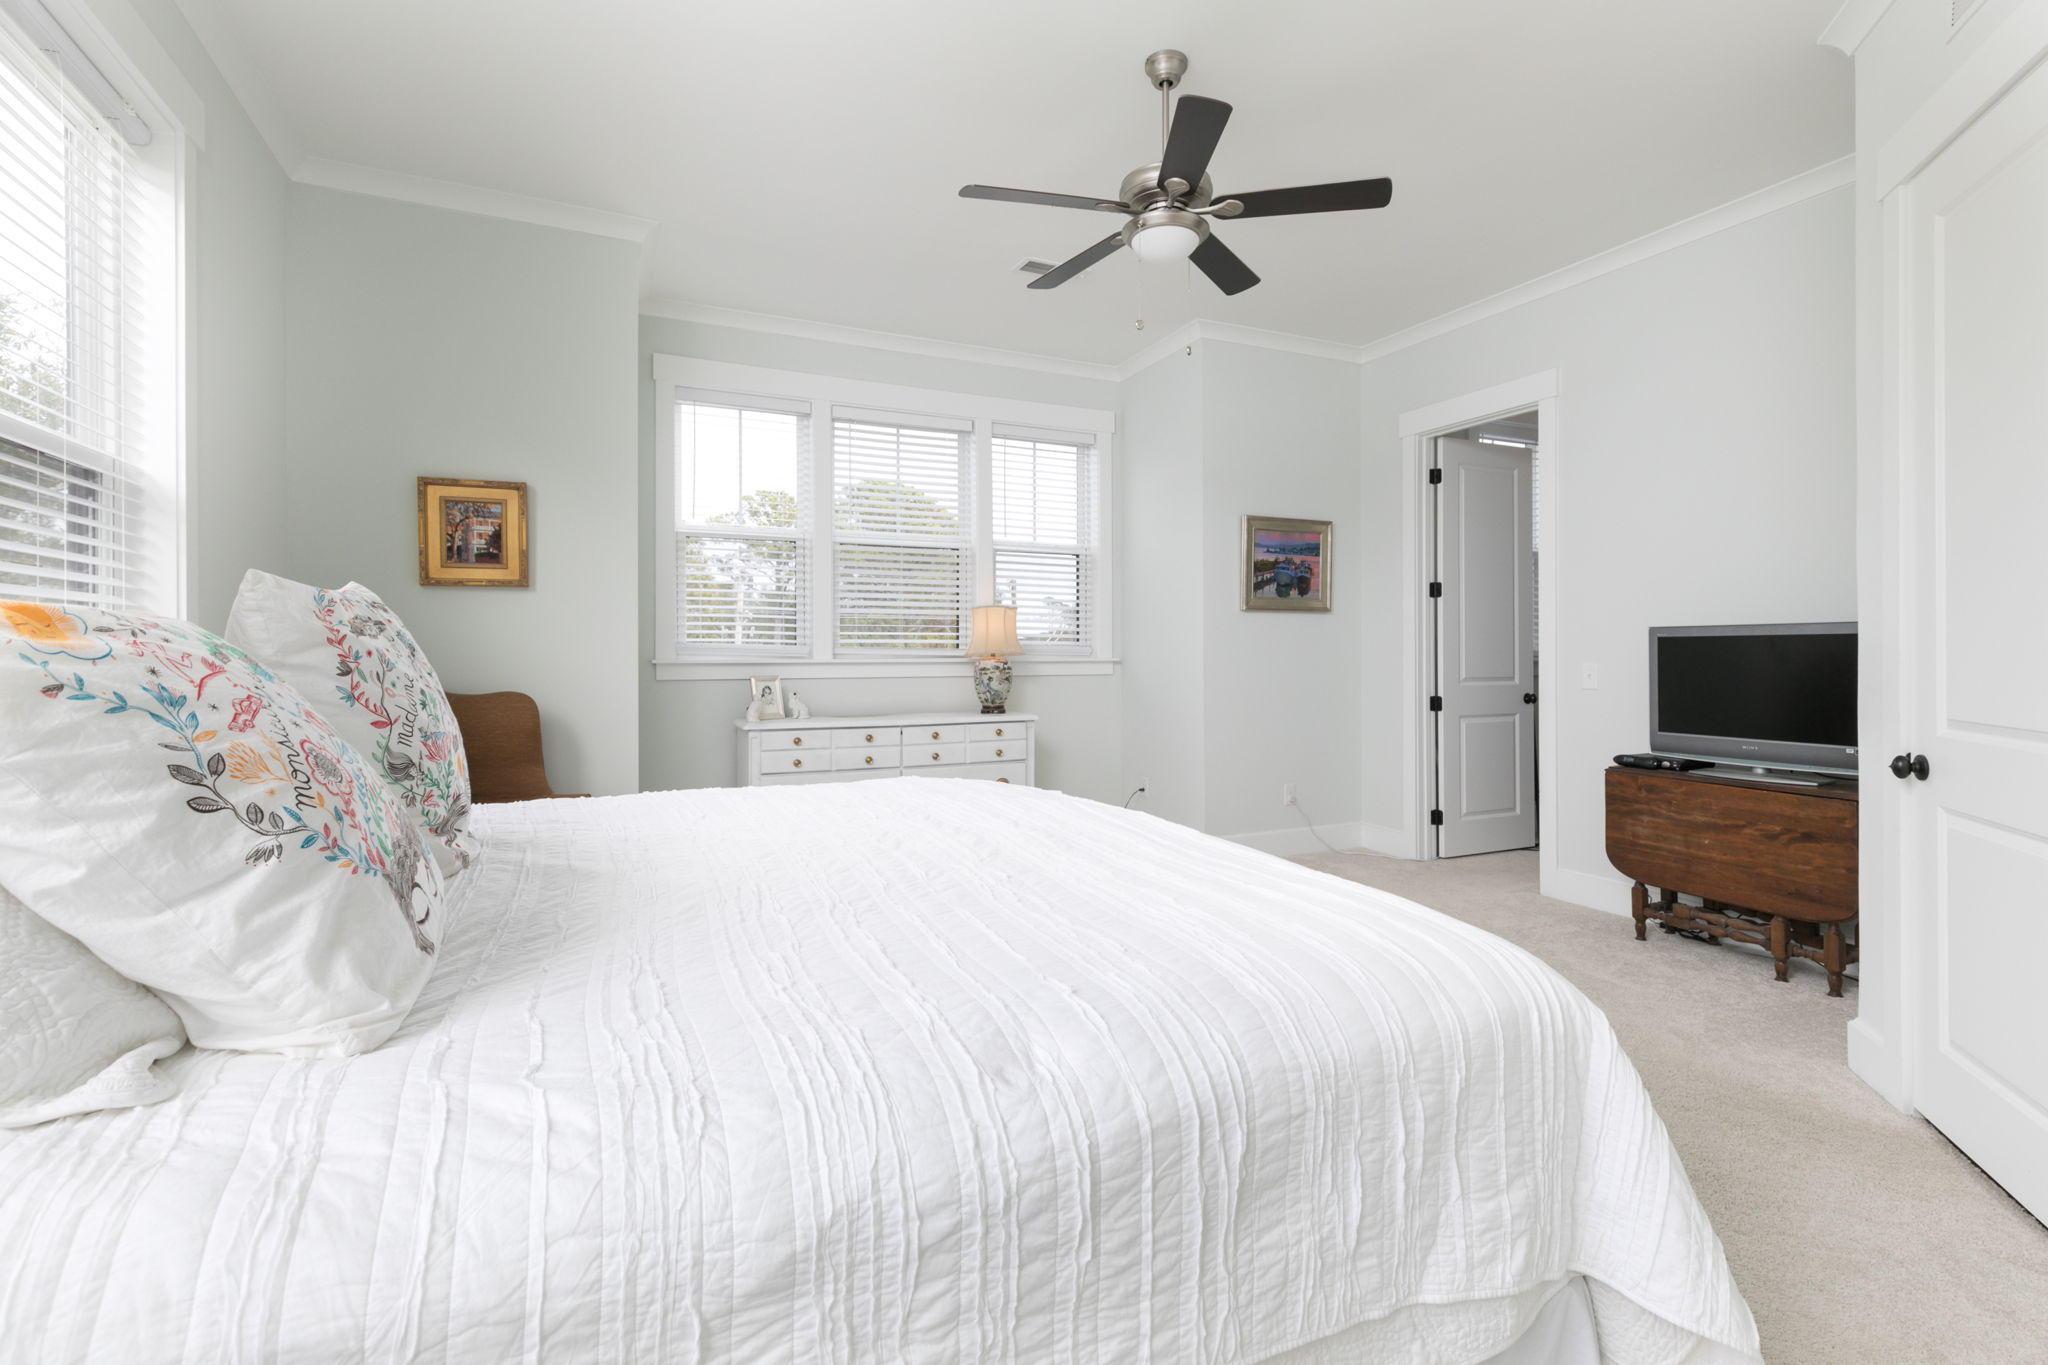 Sullivans Pointe Homes For Sale - 954 Key Colony, Mount Pleasant, SC - 21